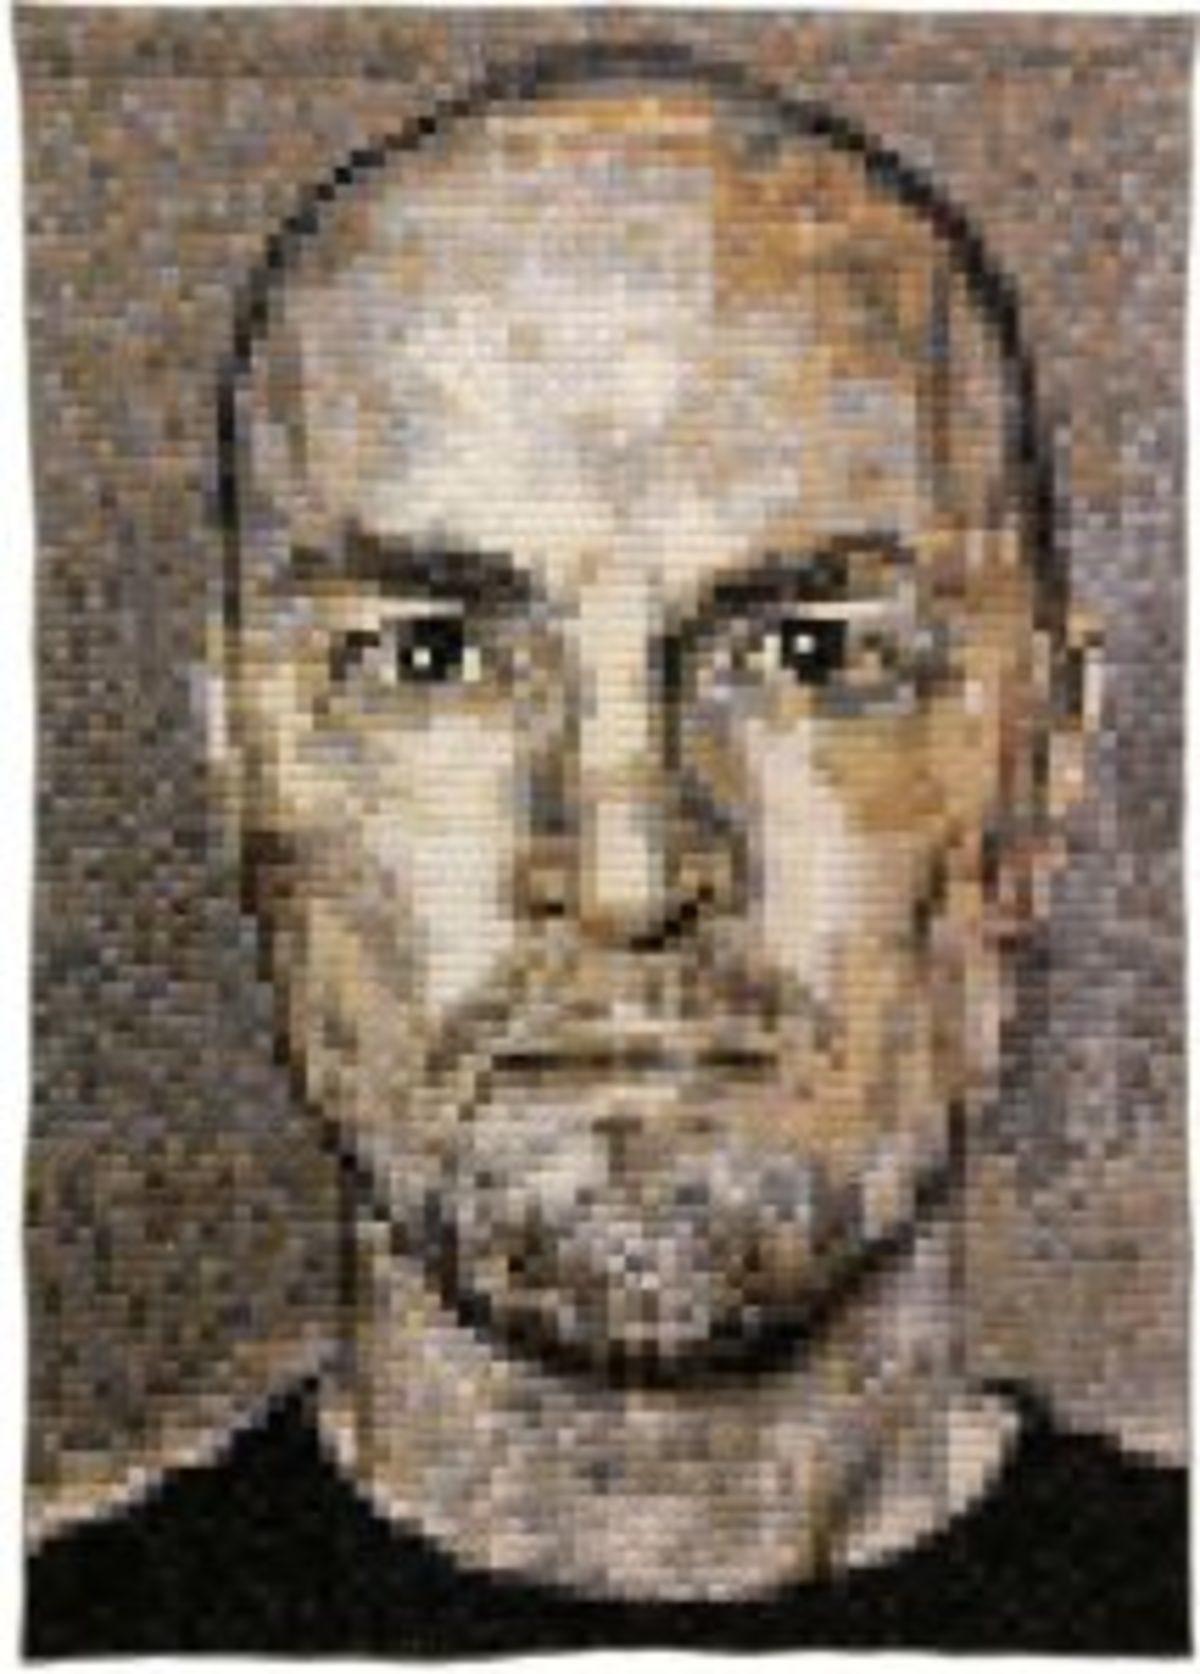 Face-of-stranger-Erick-Wolmeyer